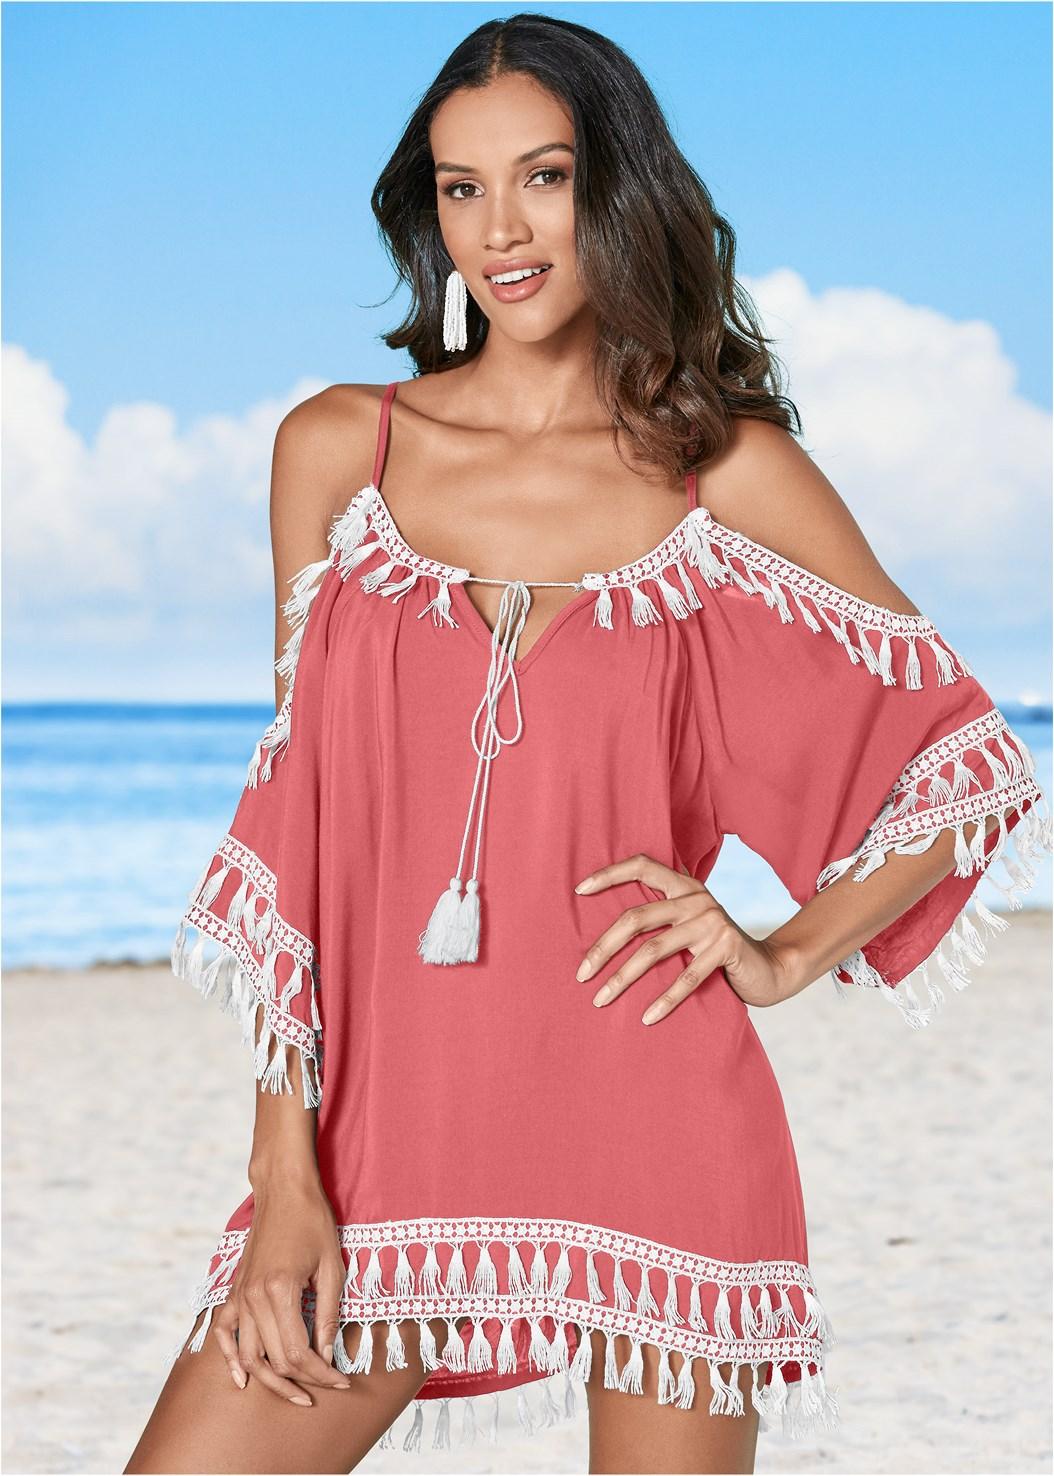 Boho Tassel Tunic Cover-Up,Scoop Front Bikini Bottom